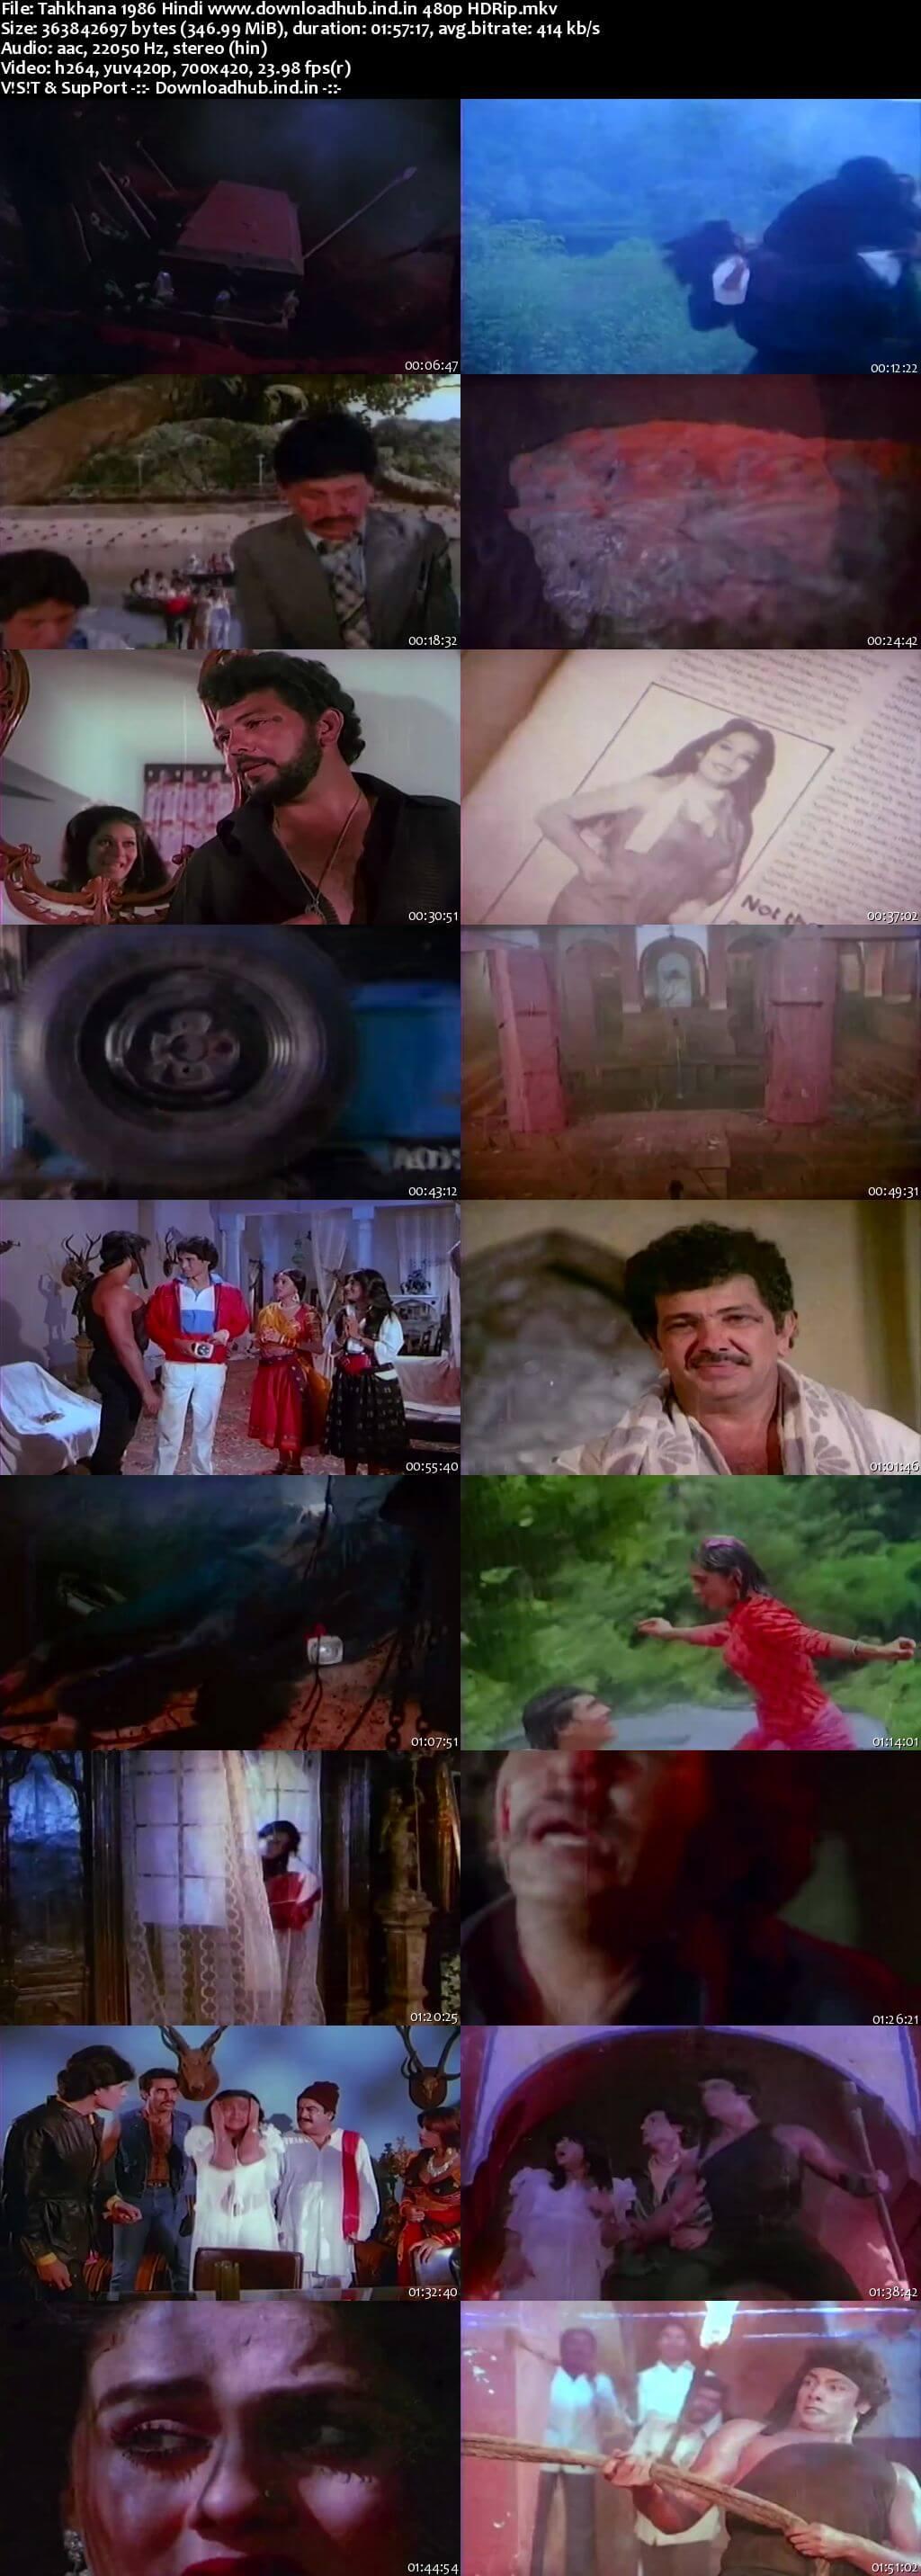 Tahkhana 1986 Hindi 300MB HDRip 480p